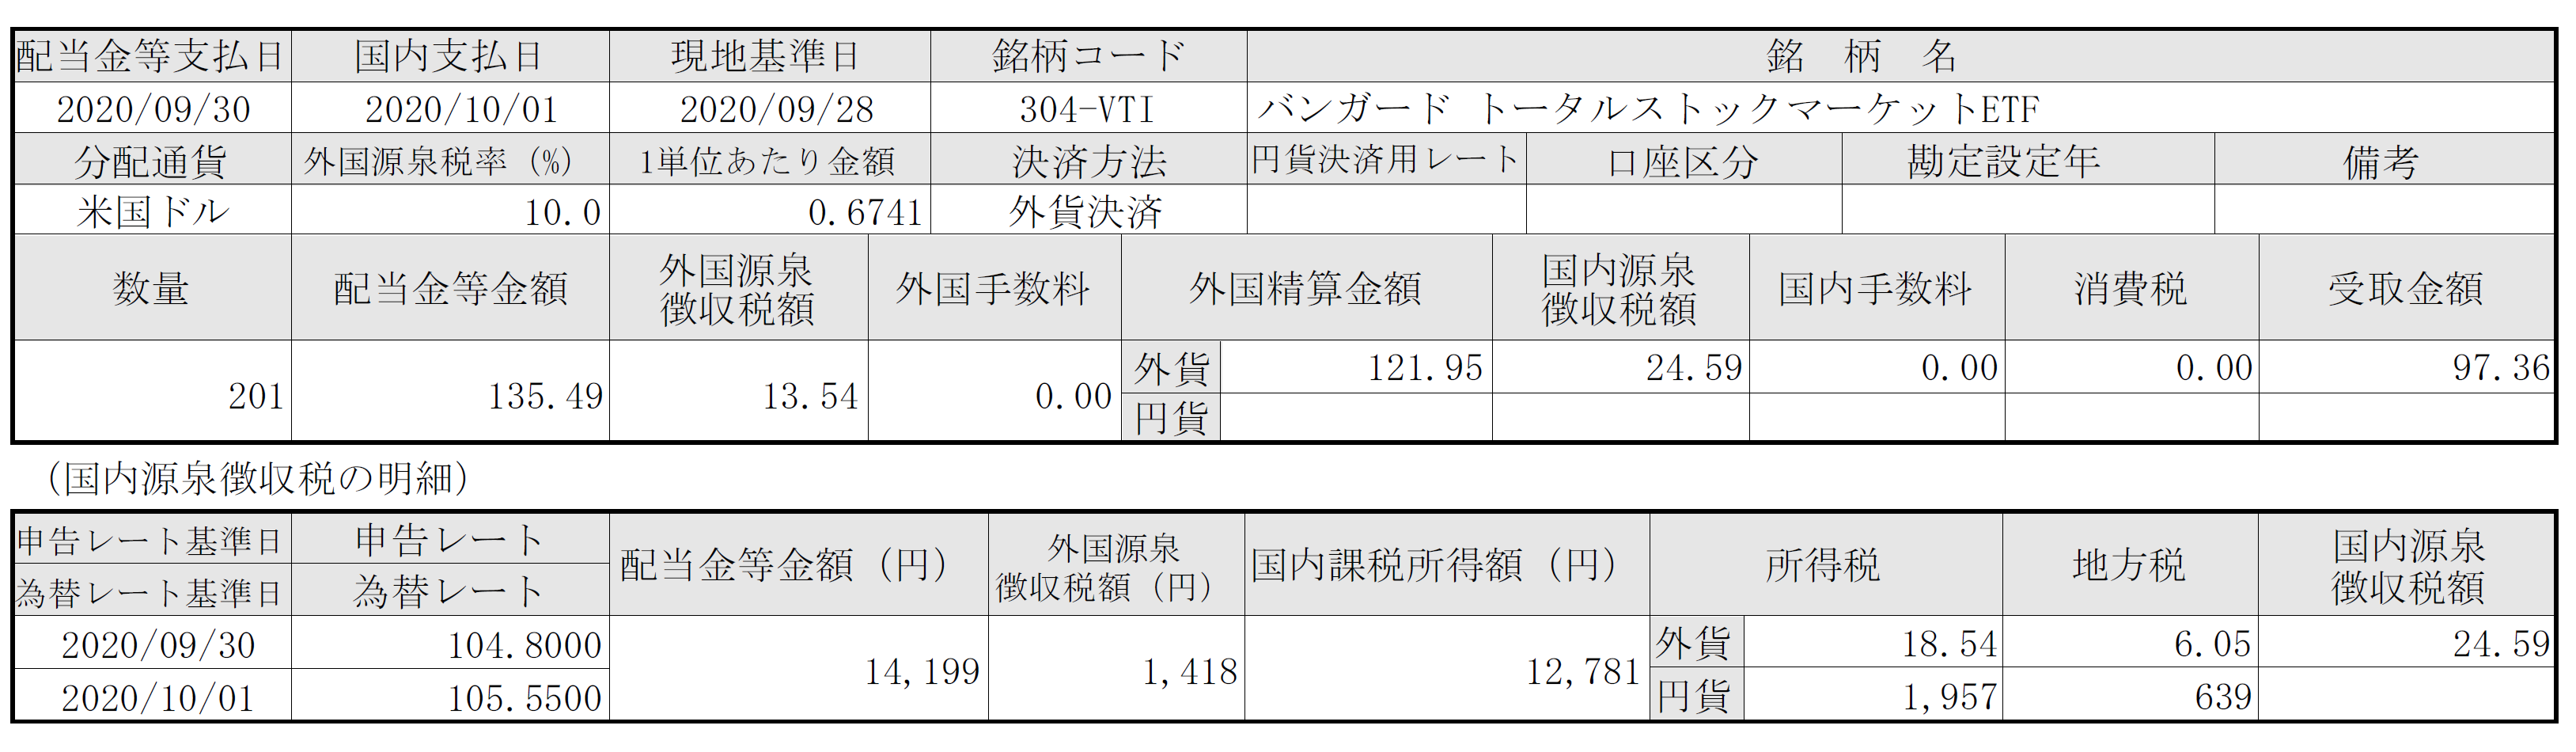 f:id:hodo-work:20201007162906p:plain